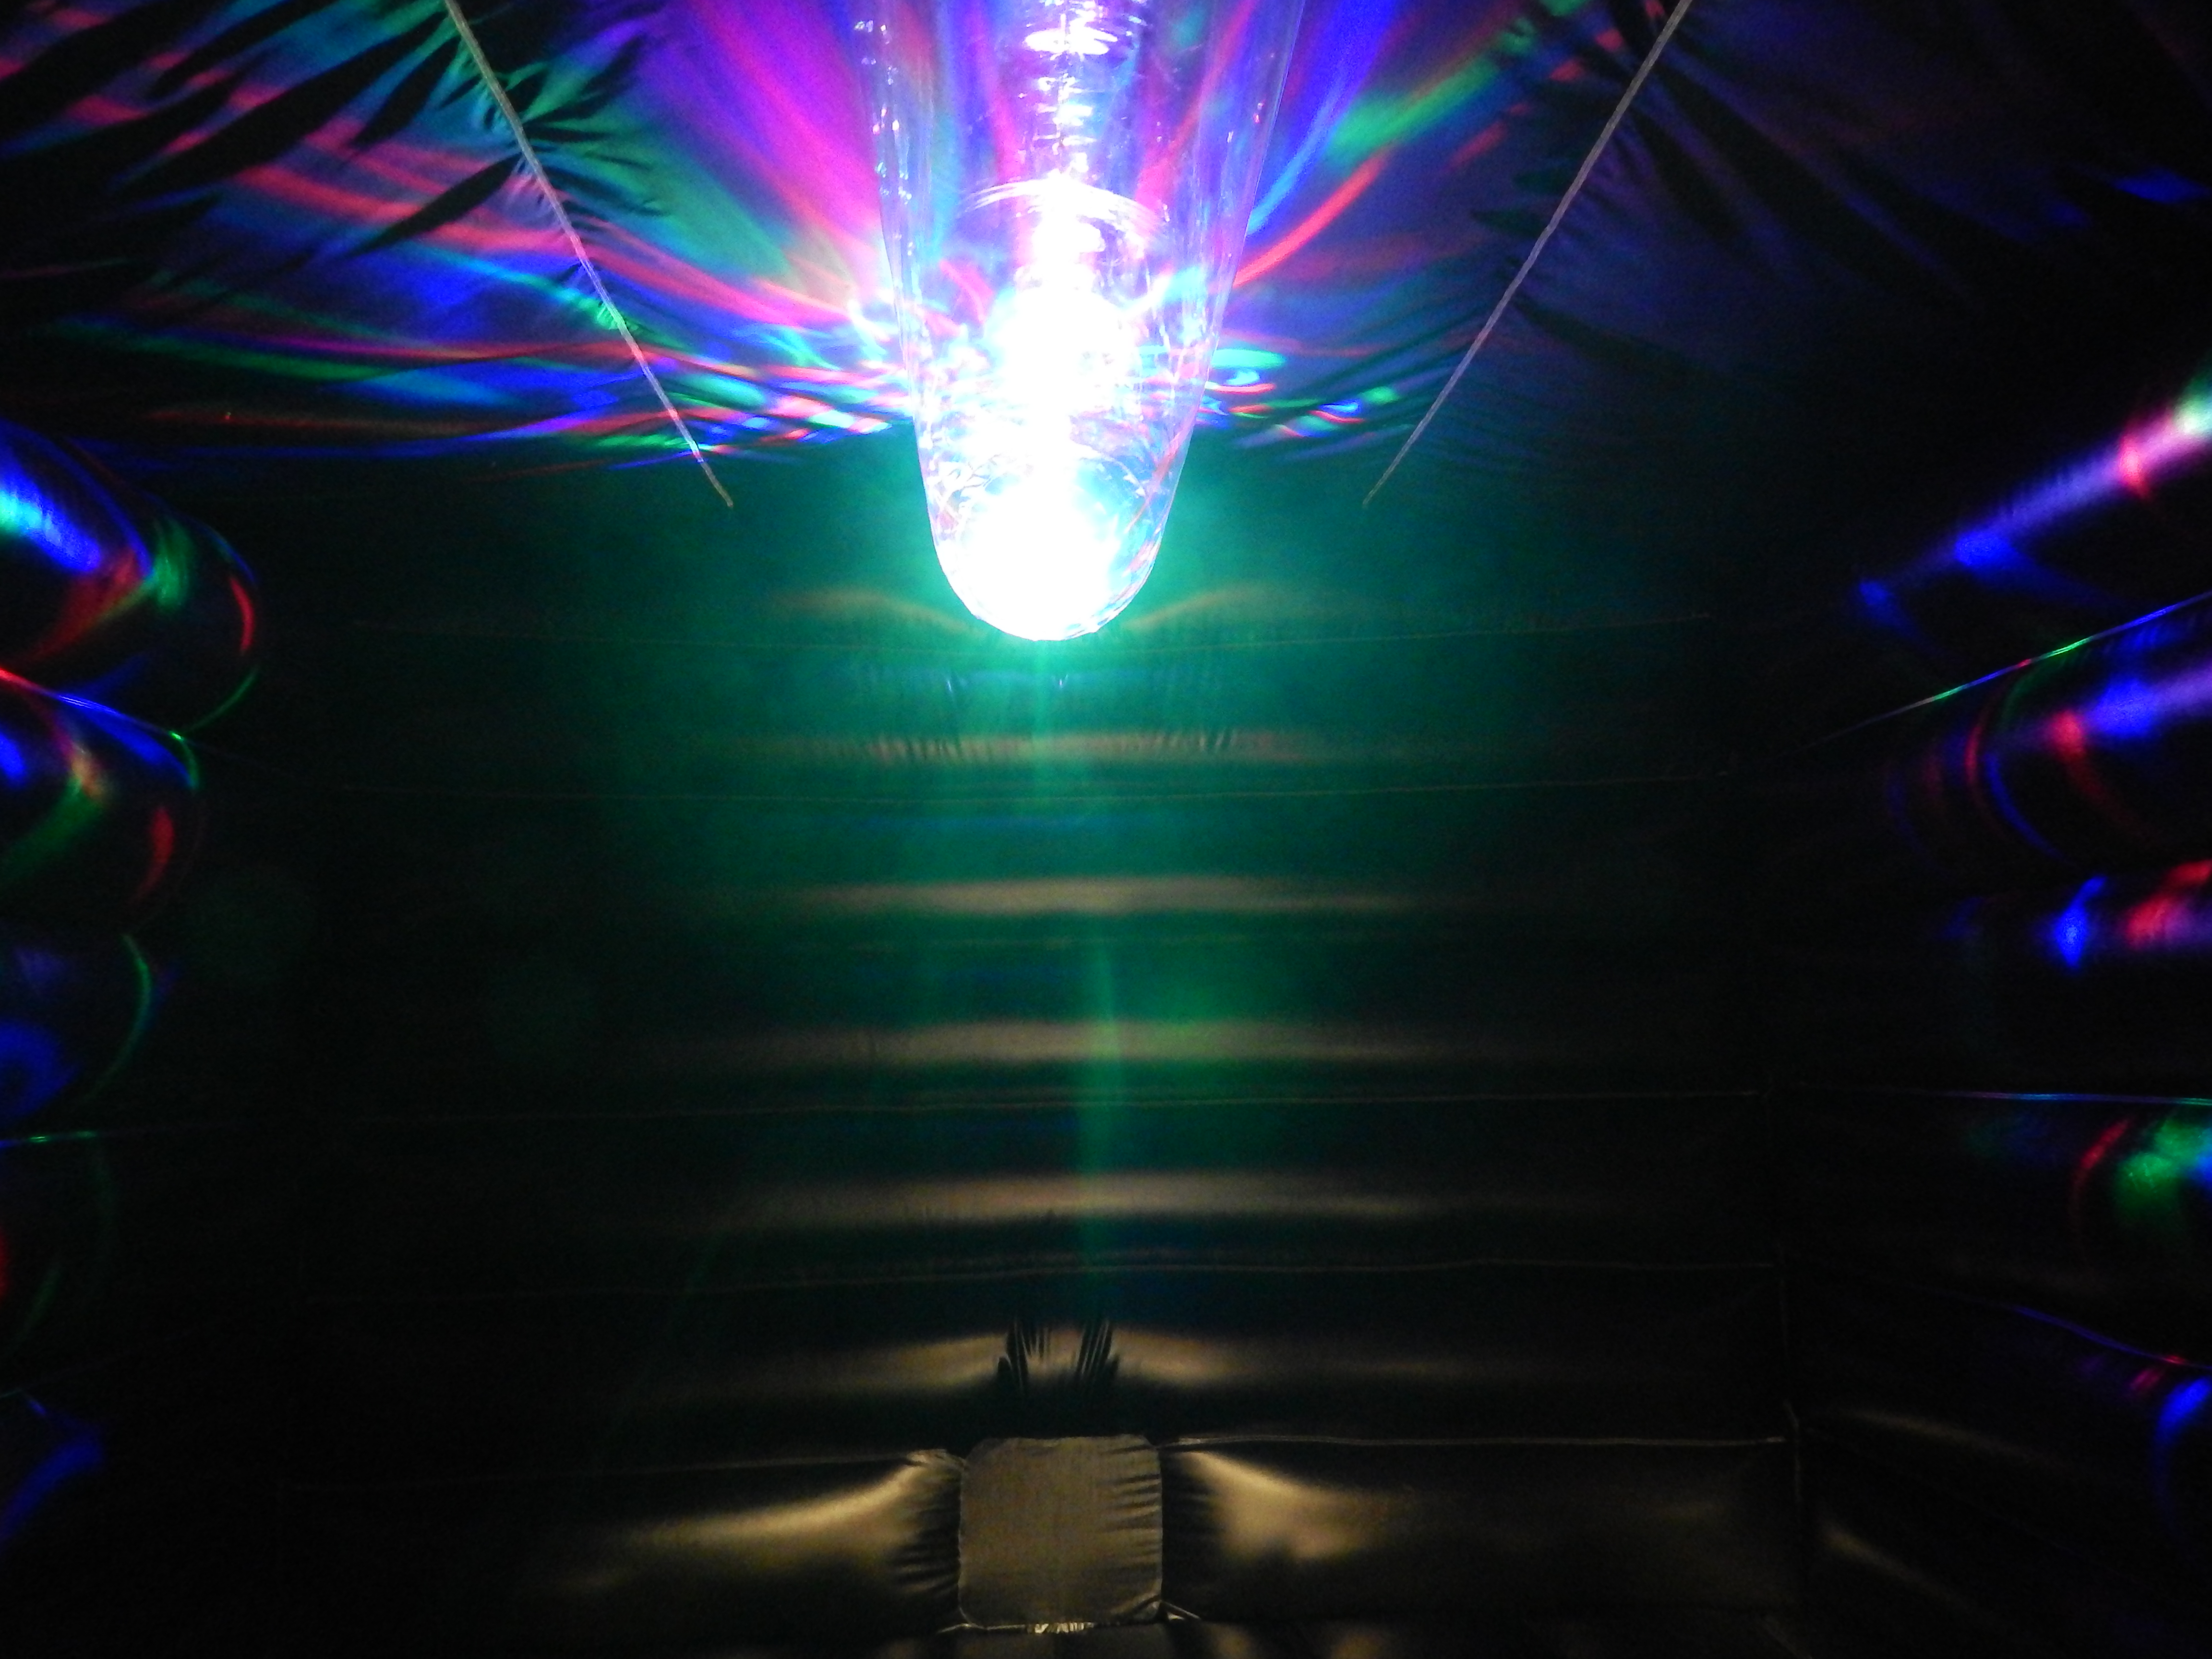 Colour changing LEDs